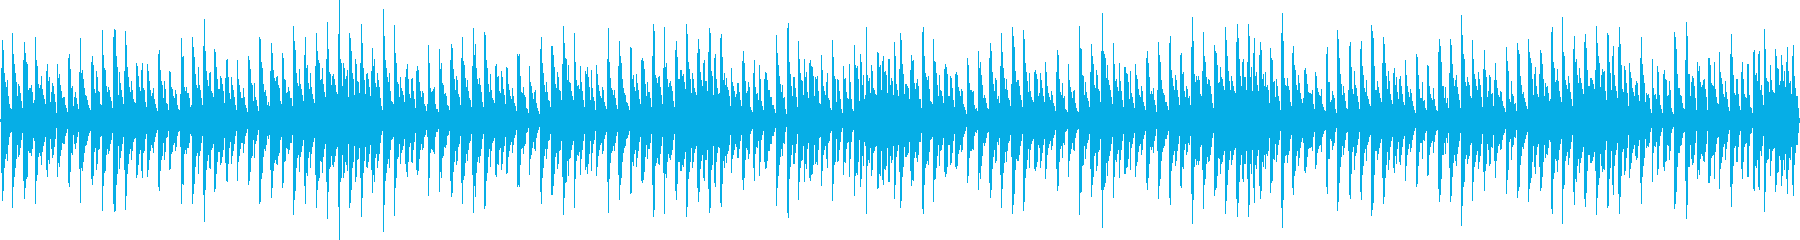 8bit、四つ打ちのチップチューンの再生済みの波形